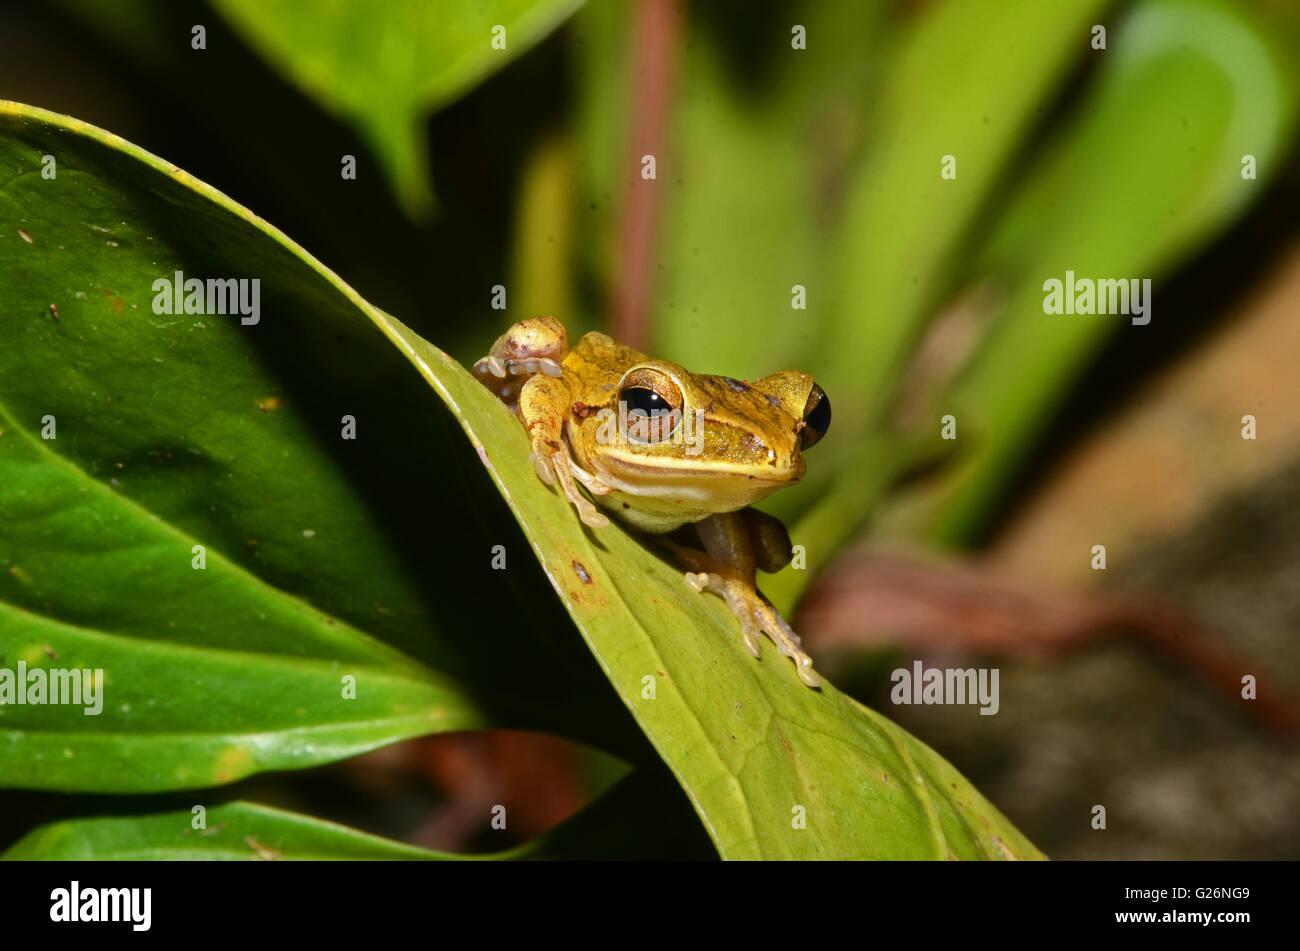 A tree frog sits on a leaf, Khao Sok, Thailand - Stock Image